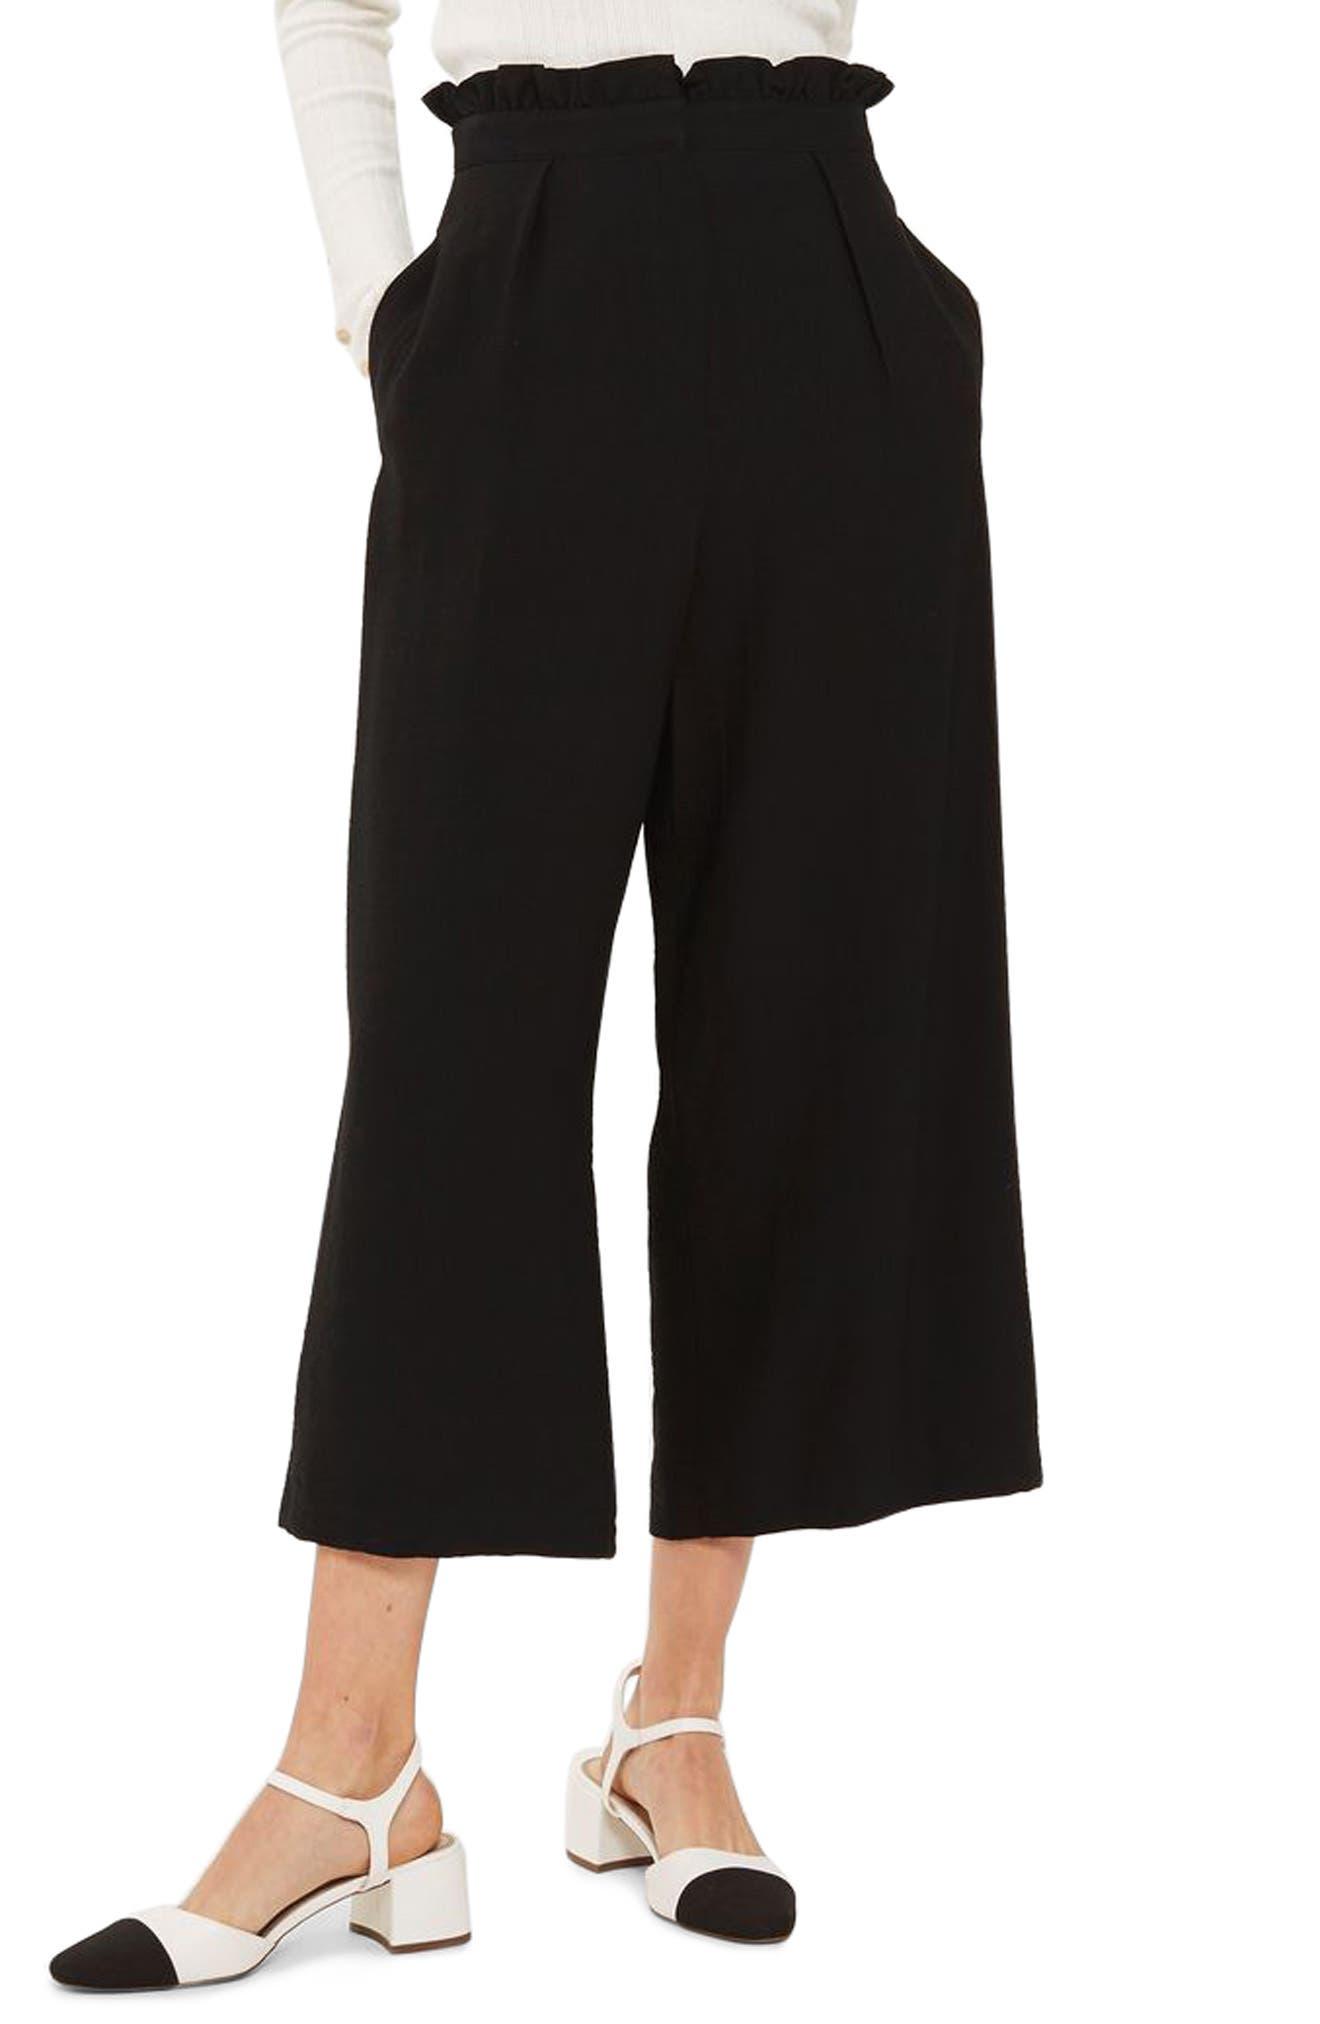 TOPSHOP, Ruffle Waist Trousers, Main thumbnail 1, color, 001